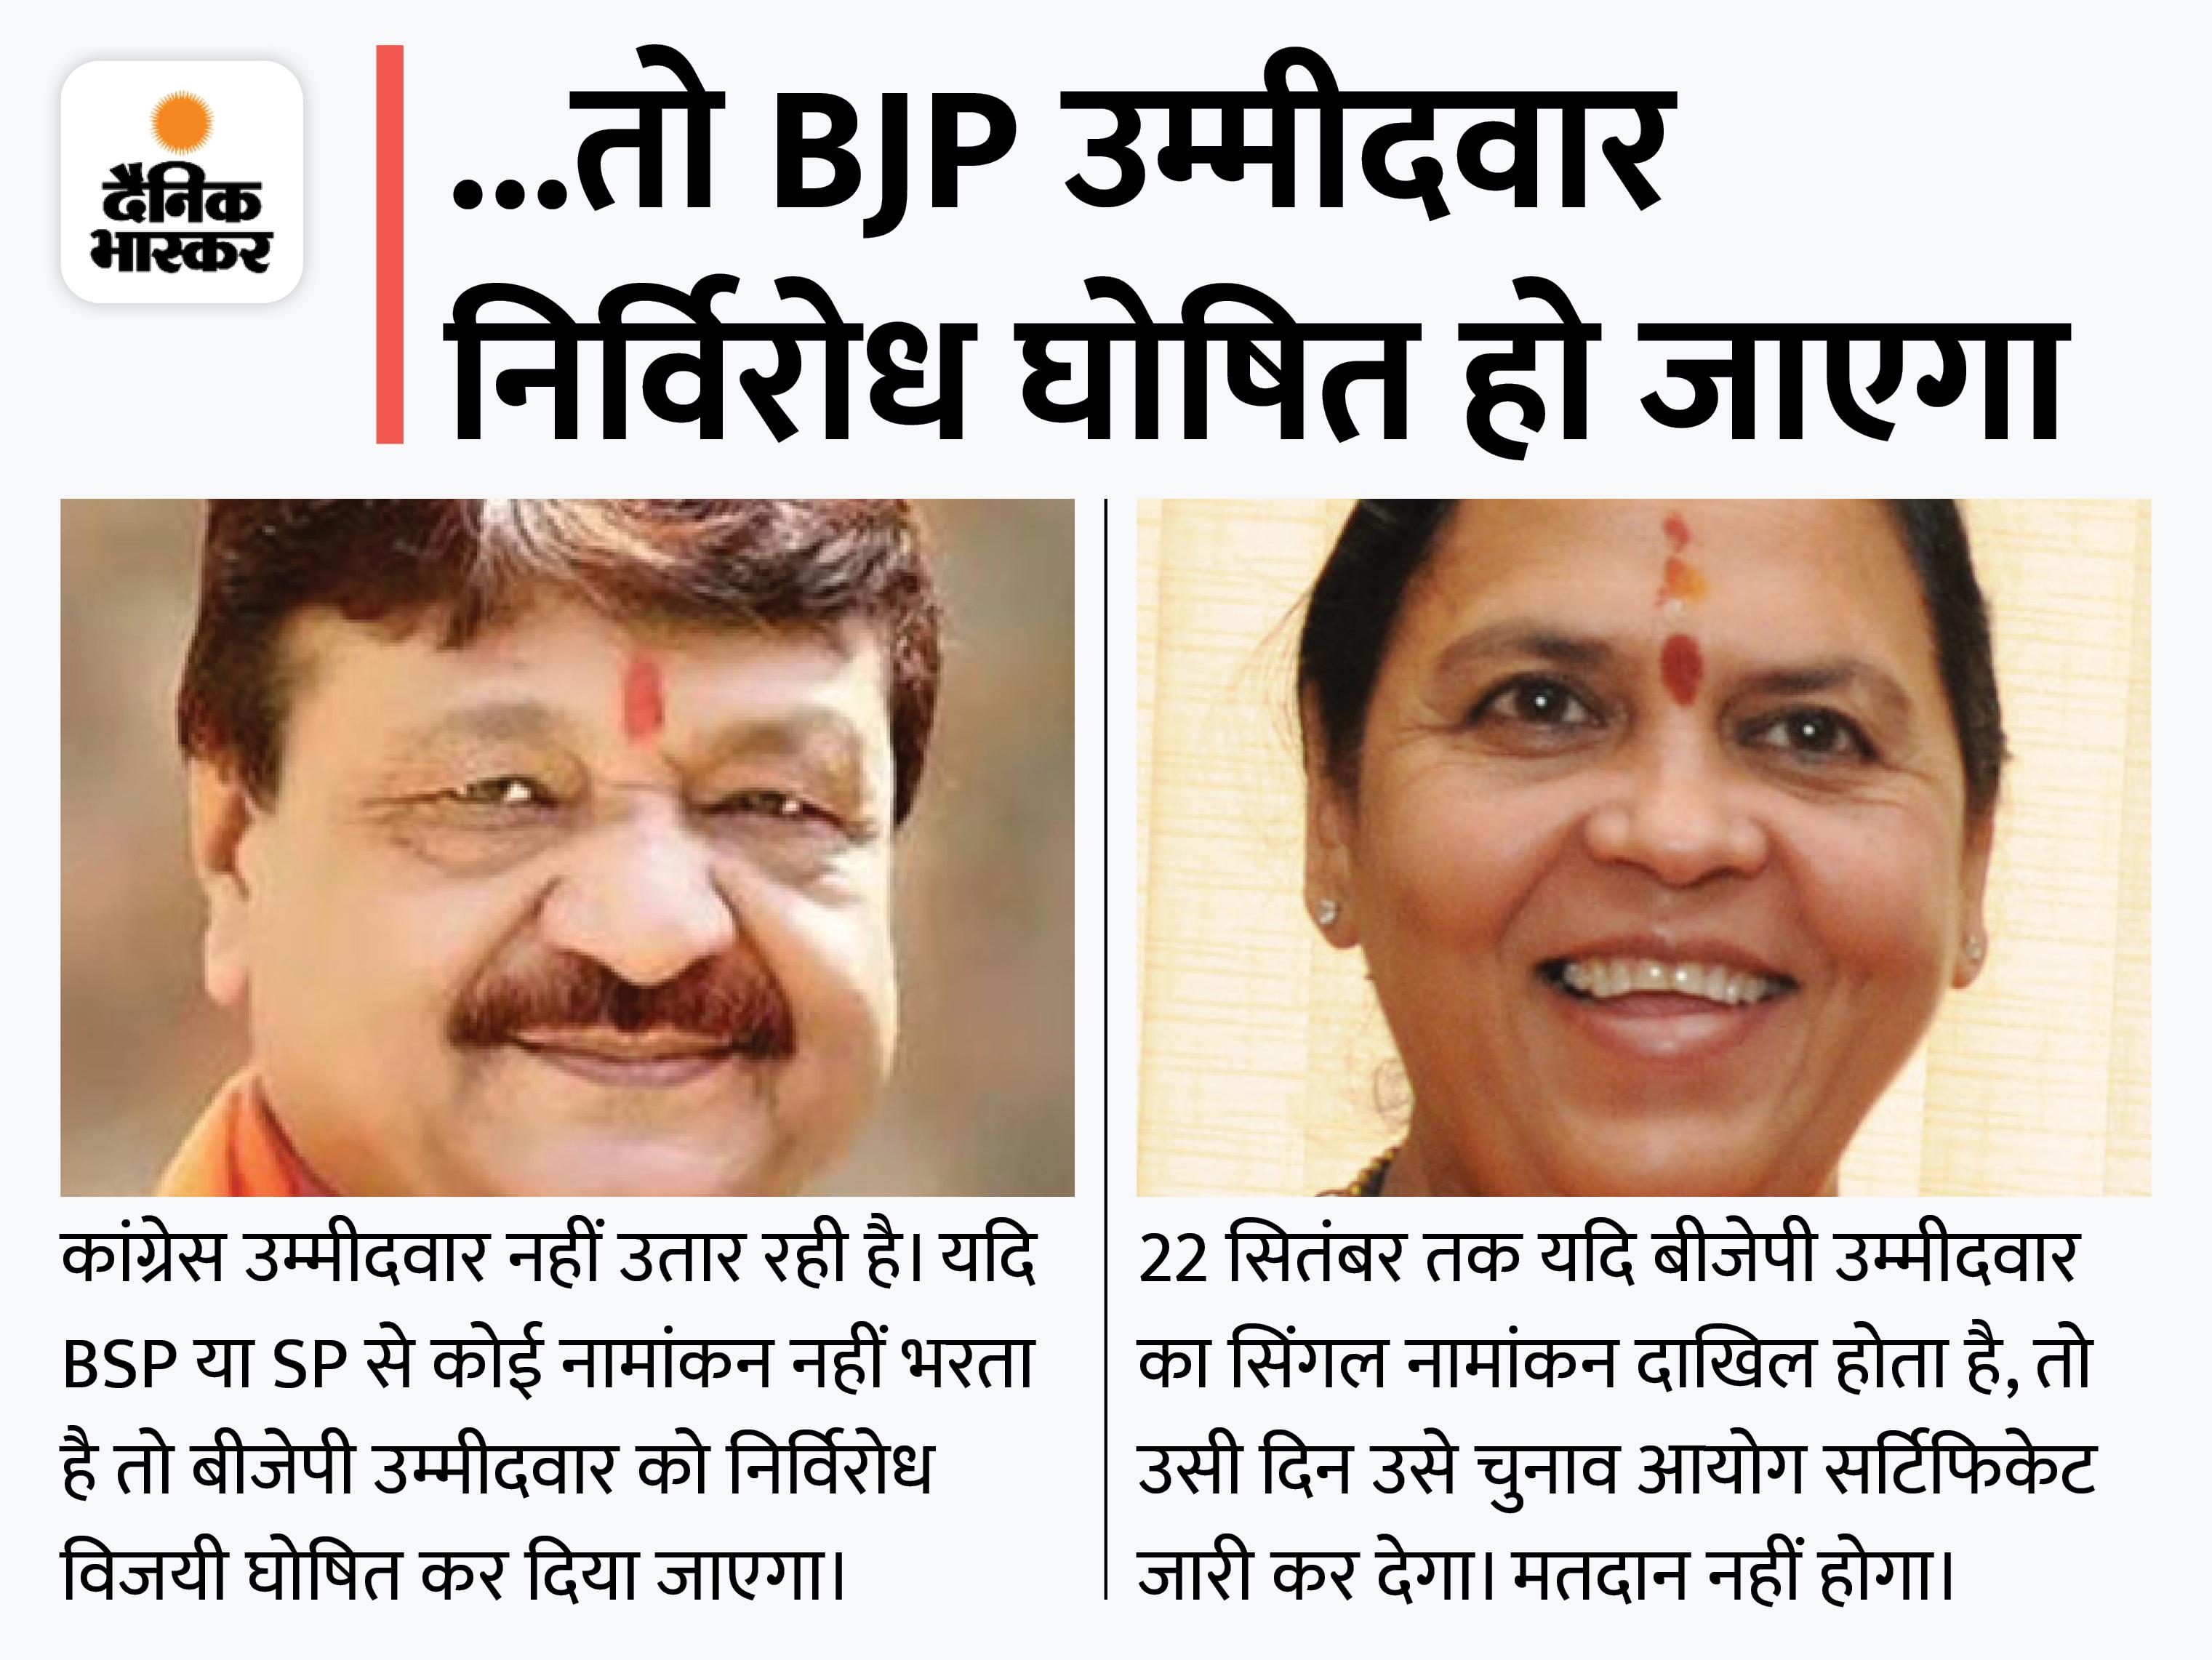 कांग्रेस नहीं उतारेगी उम्मीदवार; BJP इस सप्ताह घोषित करेगी प्रत्याशी, उमाभारती व कैलाश विजयवर्गीय भी दावेदार|मध्य प्रदेश,Madhya Pradesh - Dainik Bhaskar